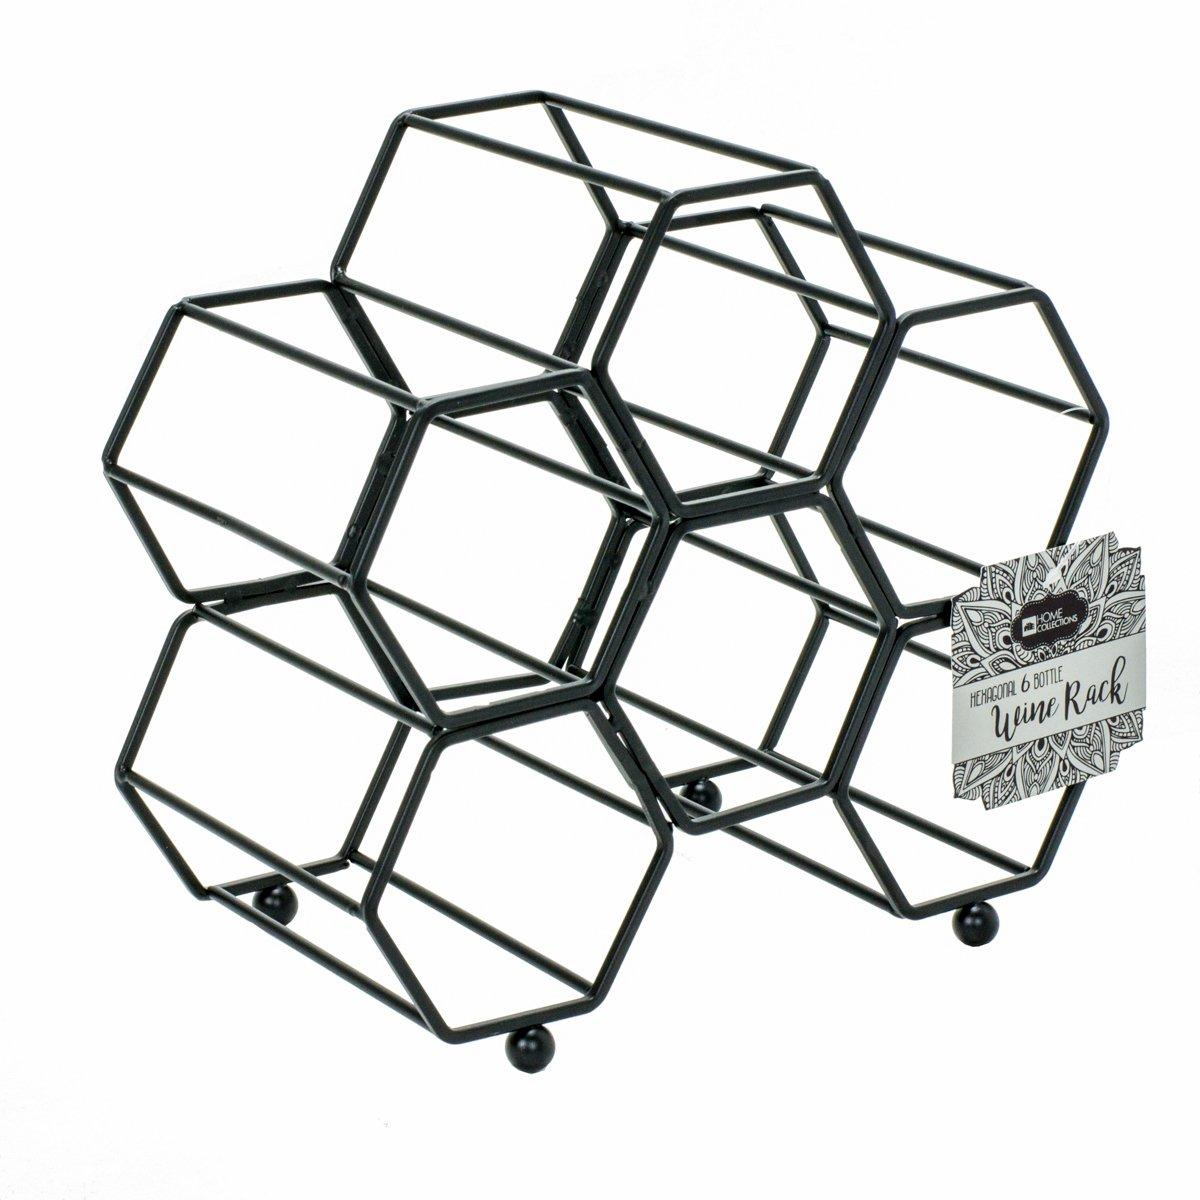 DINY Home & Style Hexagonal Free Standing Wine Rack (Black)